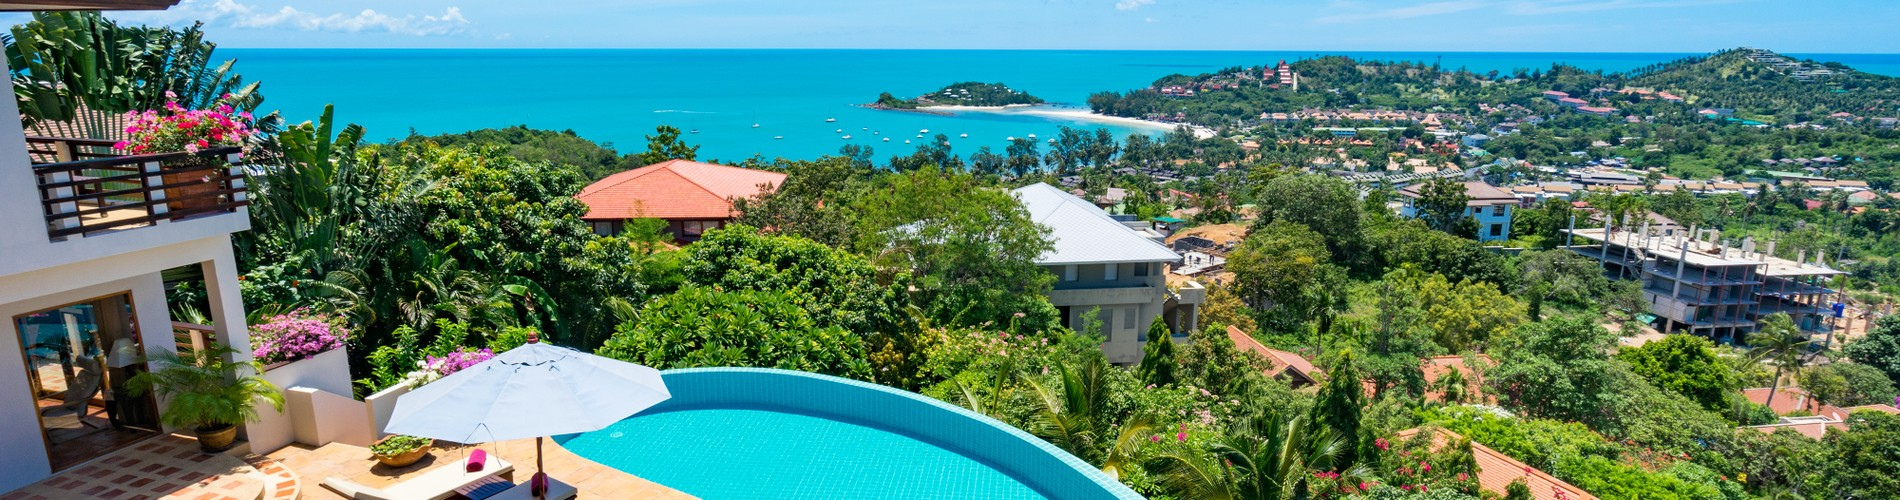 Vacation Rental Baan Arun